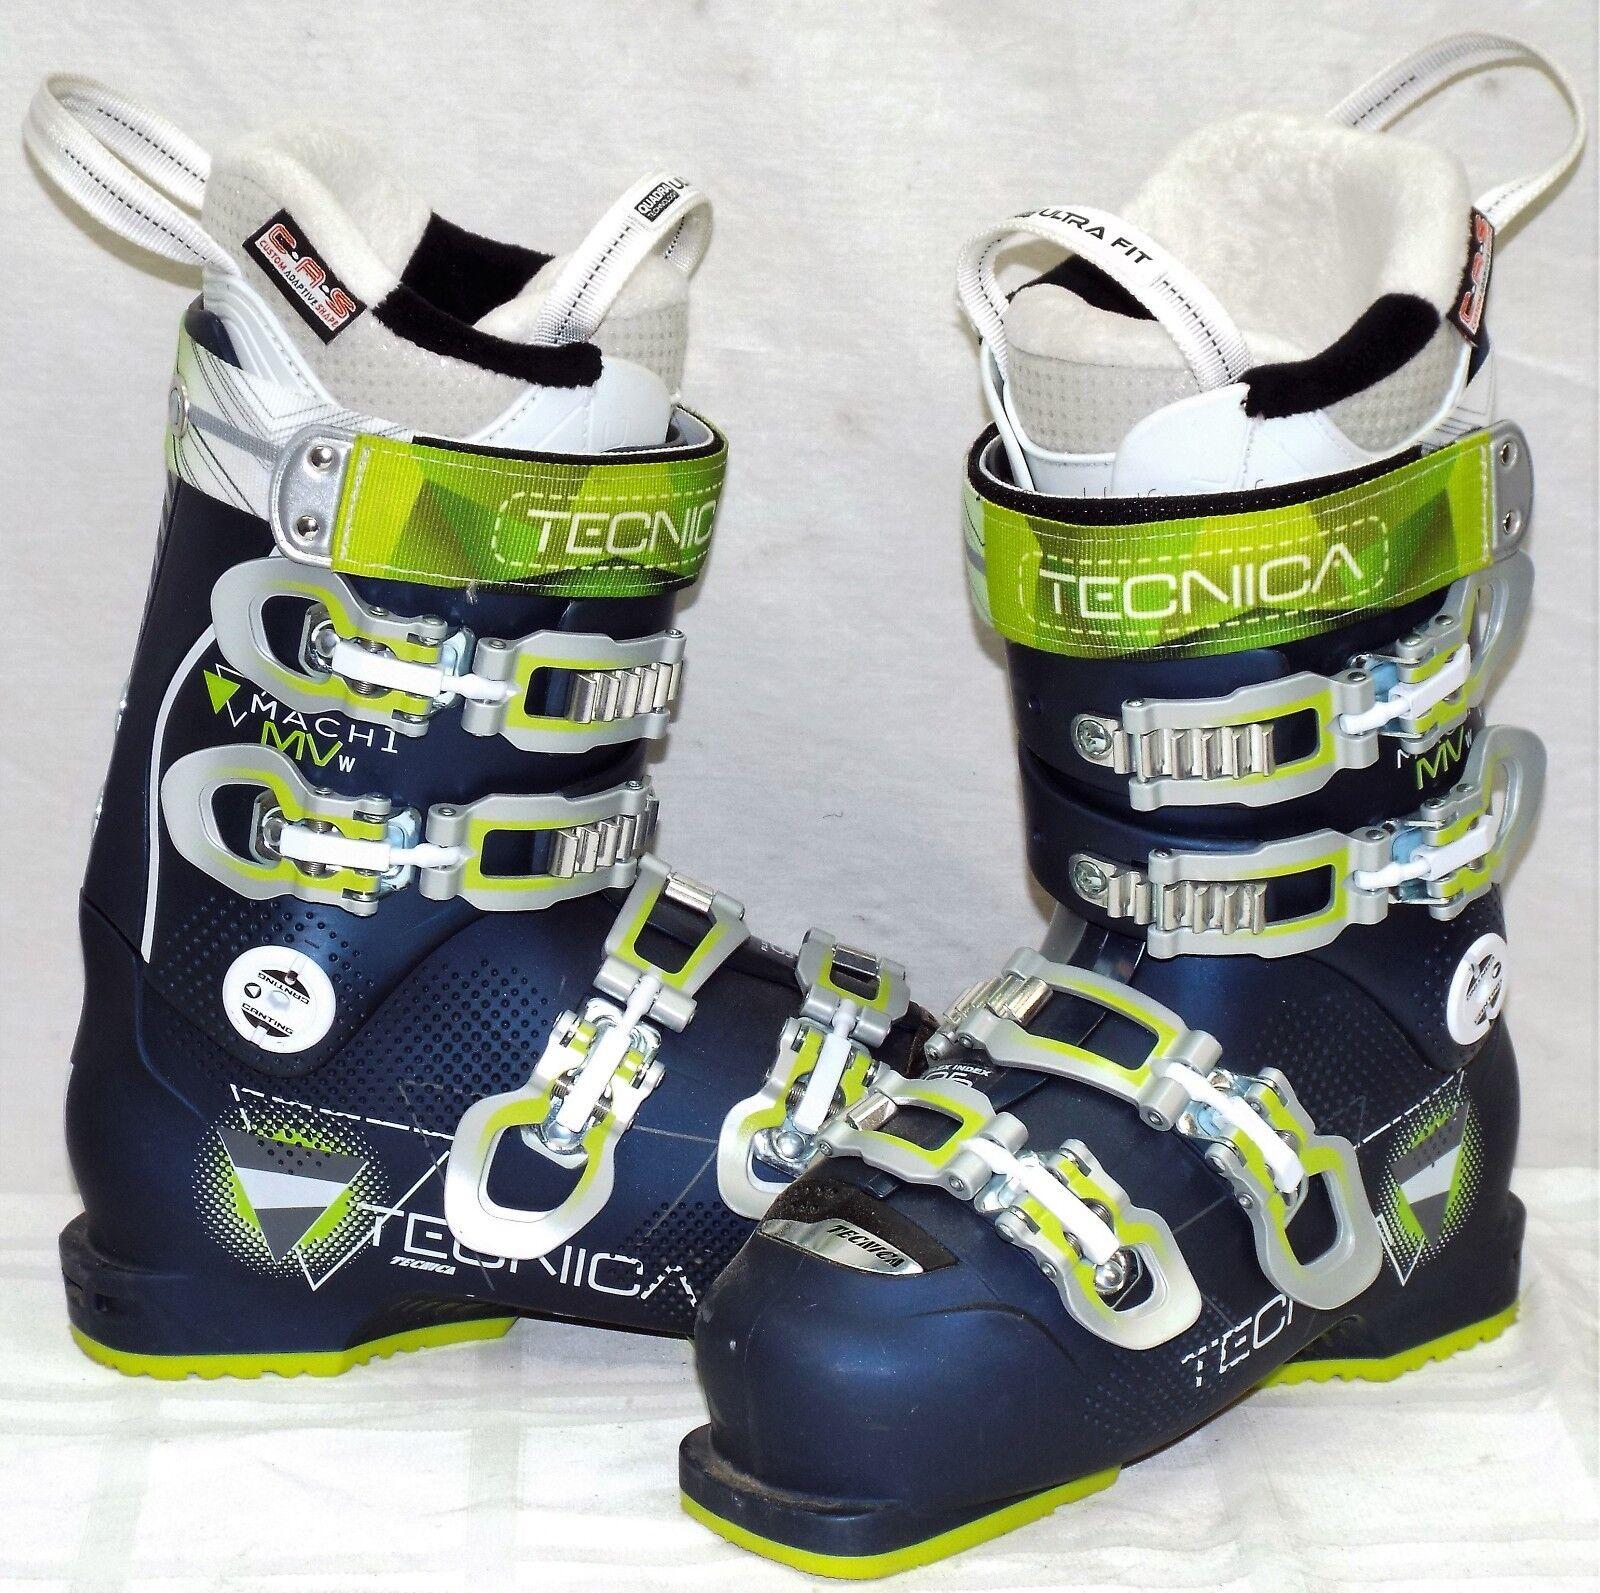 16-17 Tecnica Mach 1 95 MV Used Women's Ski Boots Size 23.5